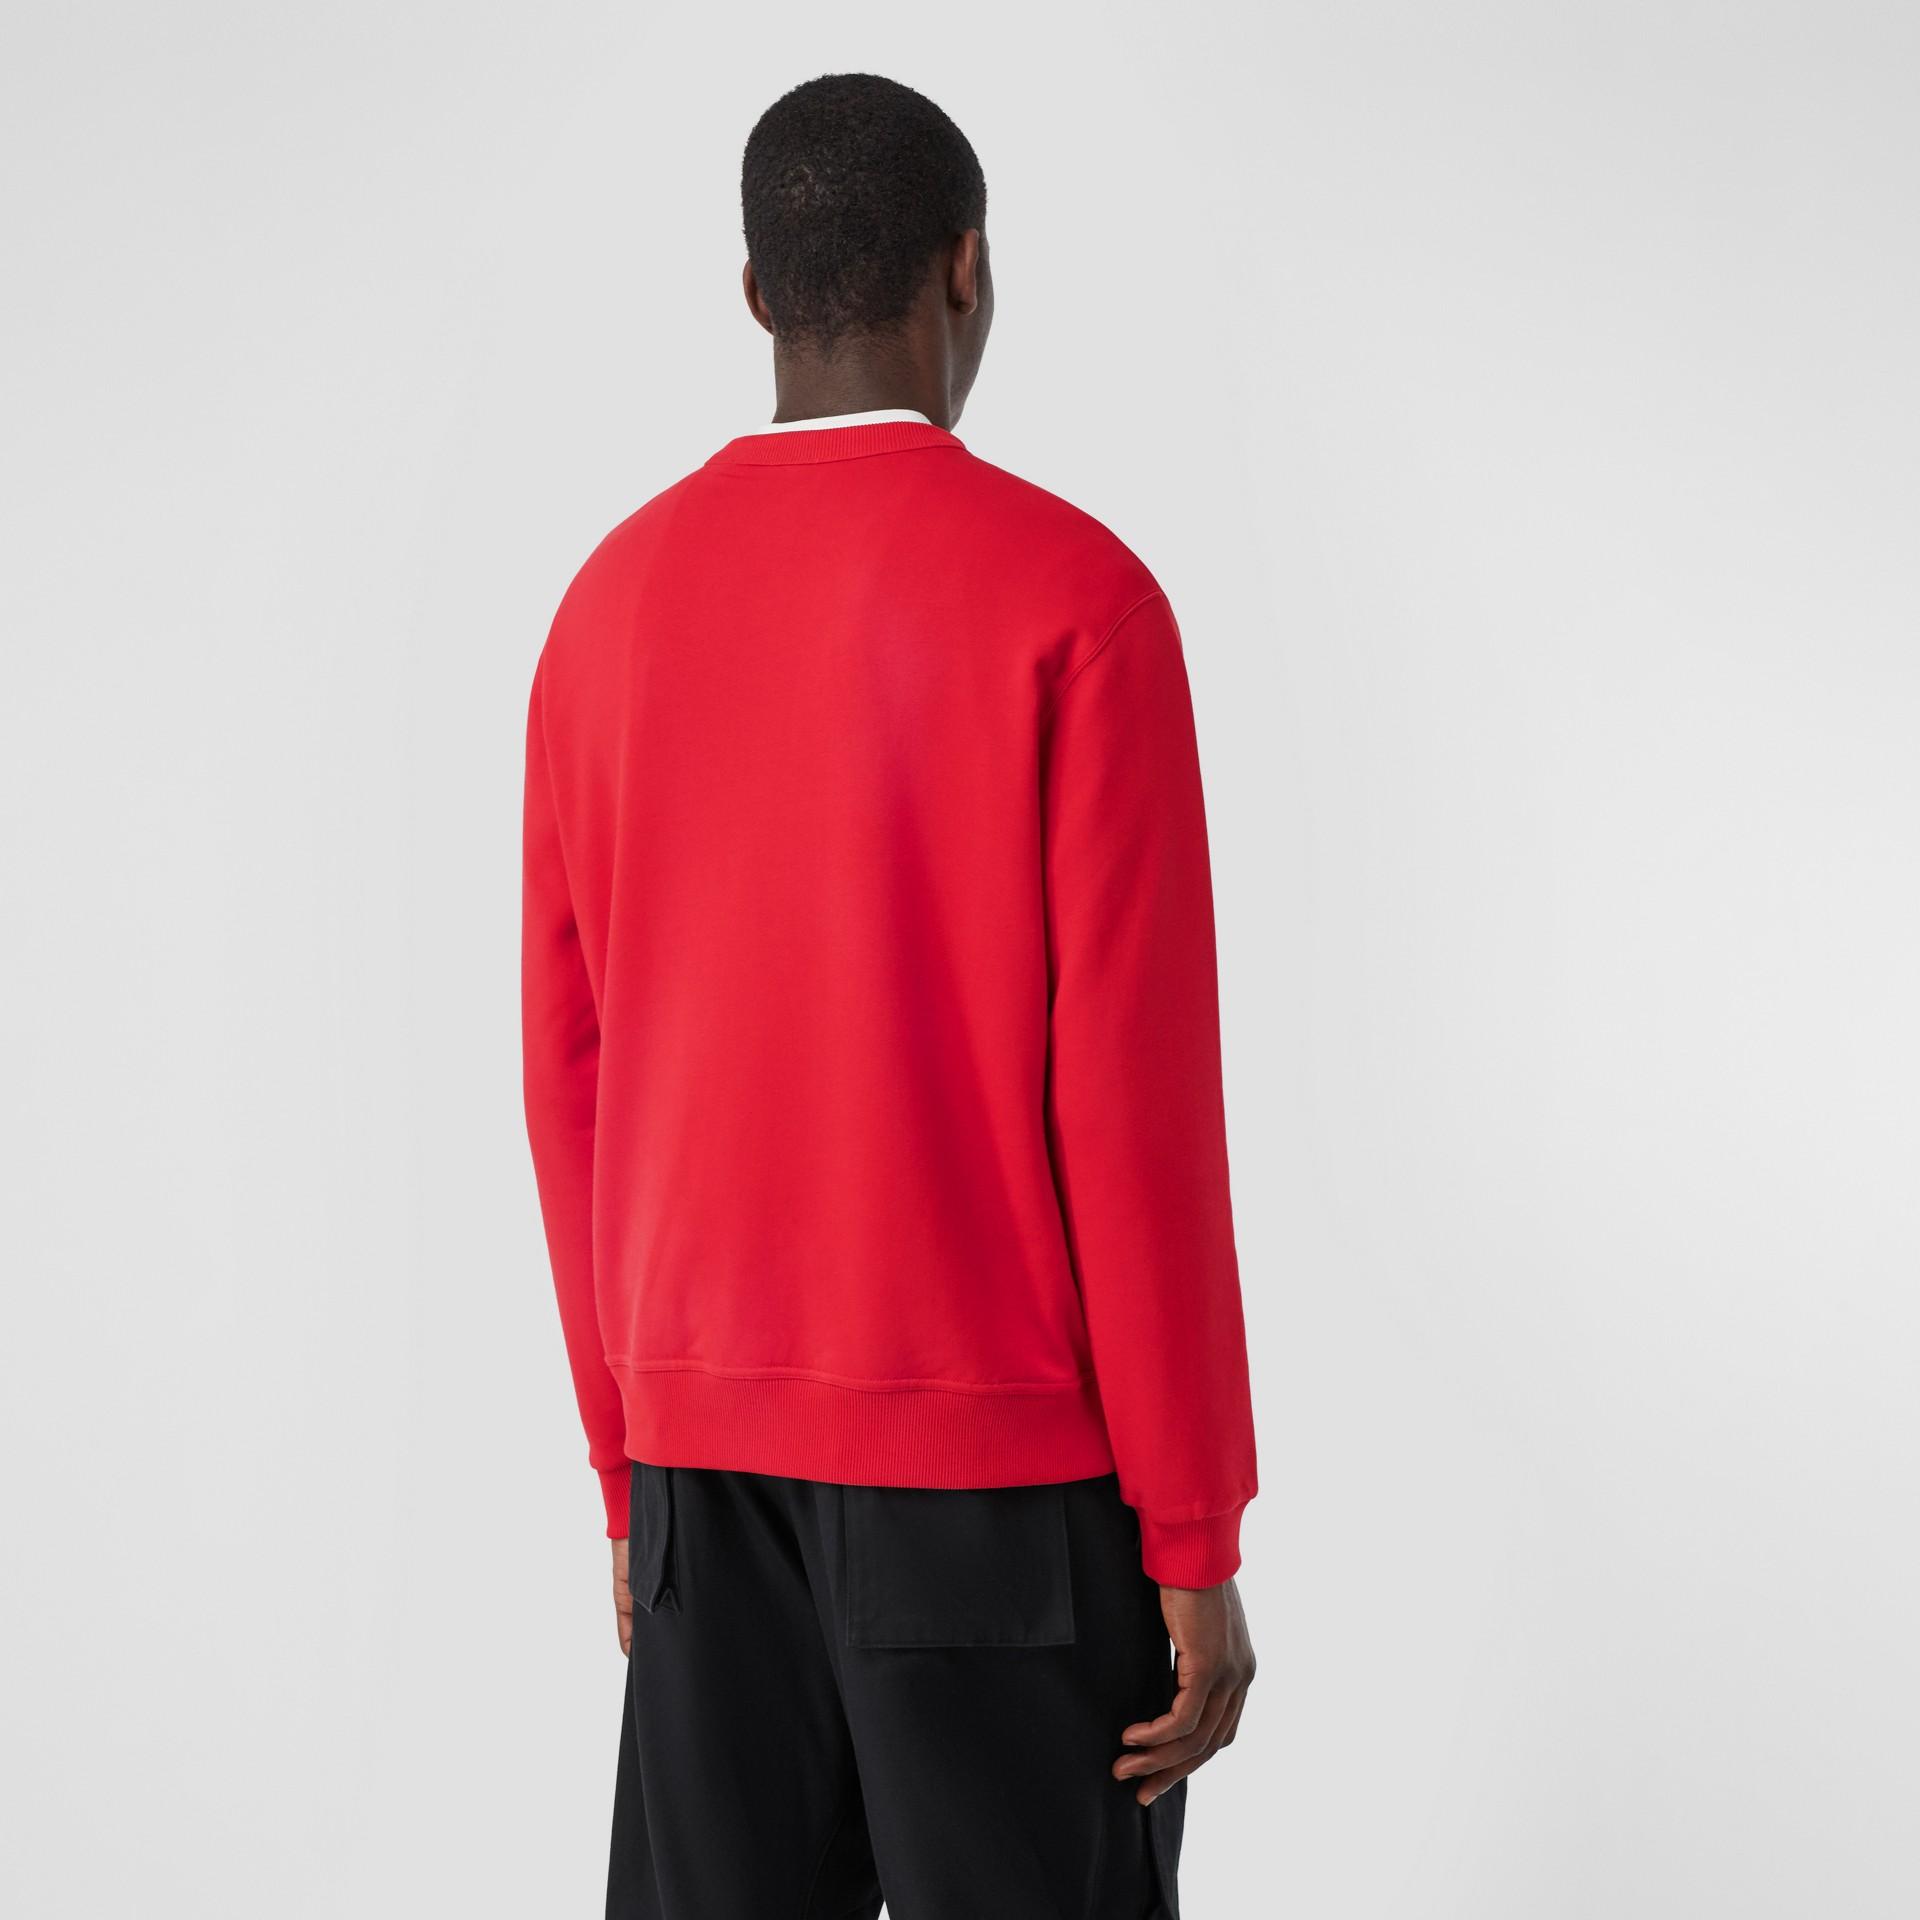 Monogram Motif Cotton Sweatshirt in Bright Red - Men | Burberry United Kingdom - gallery image 2